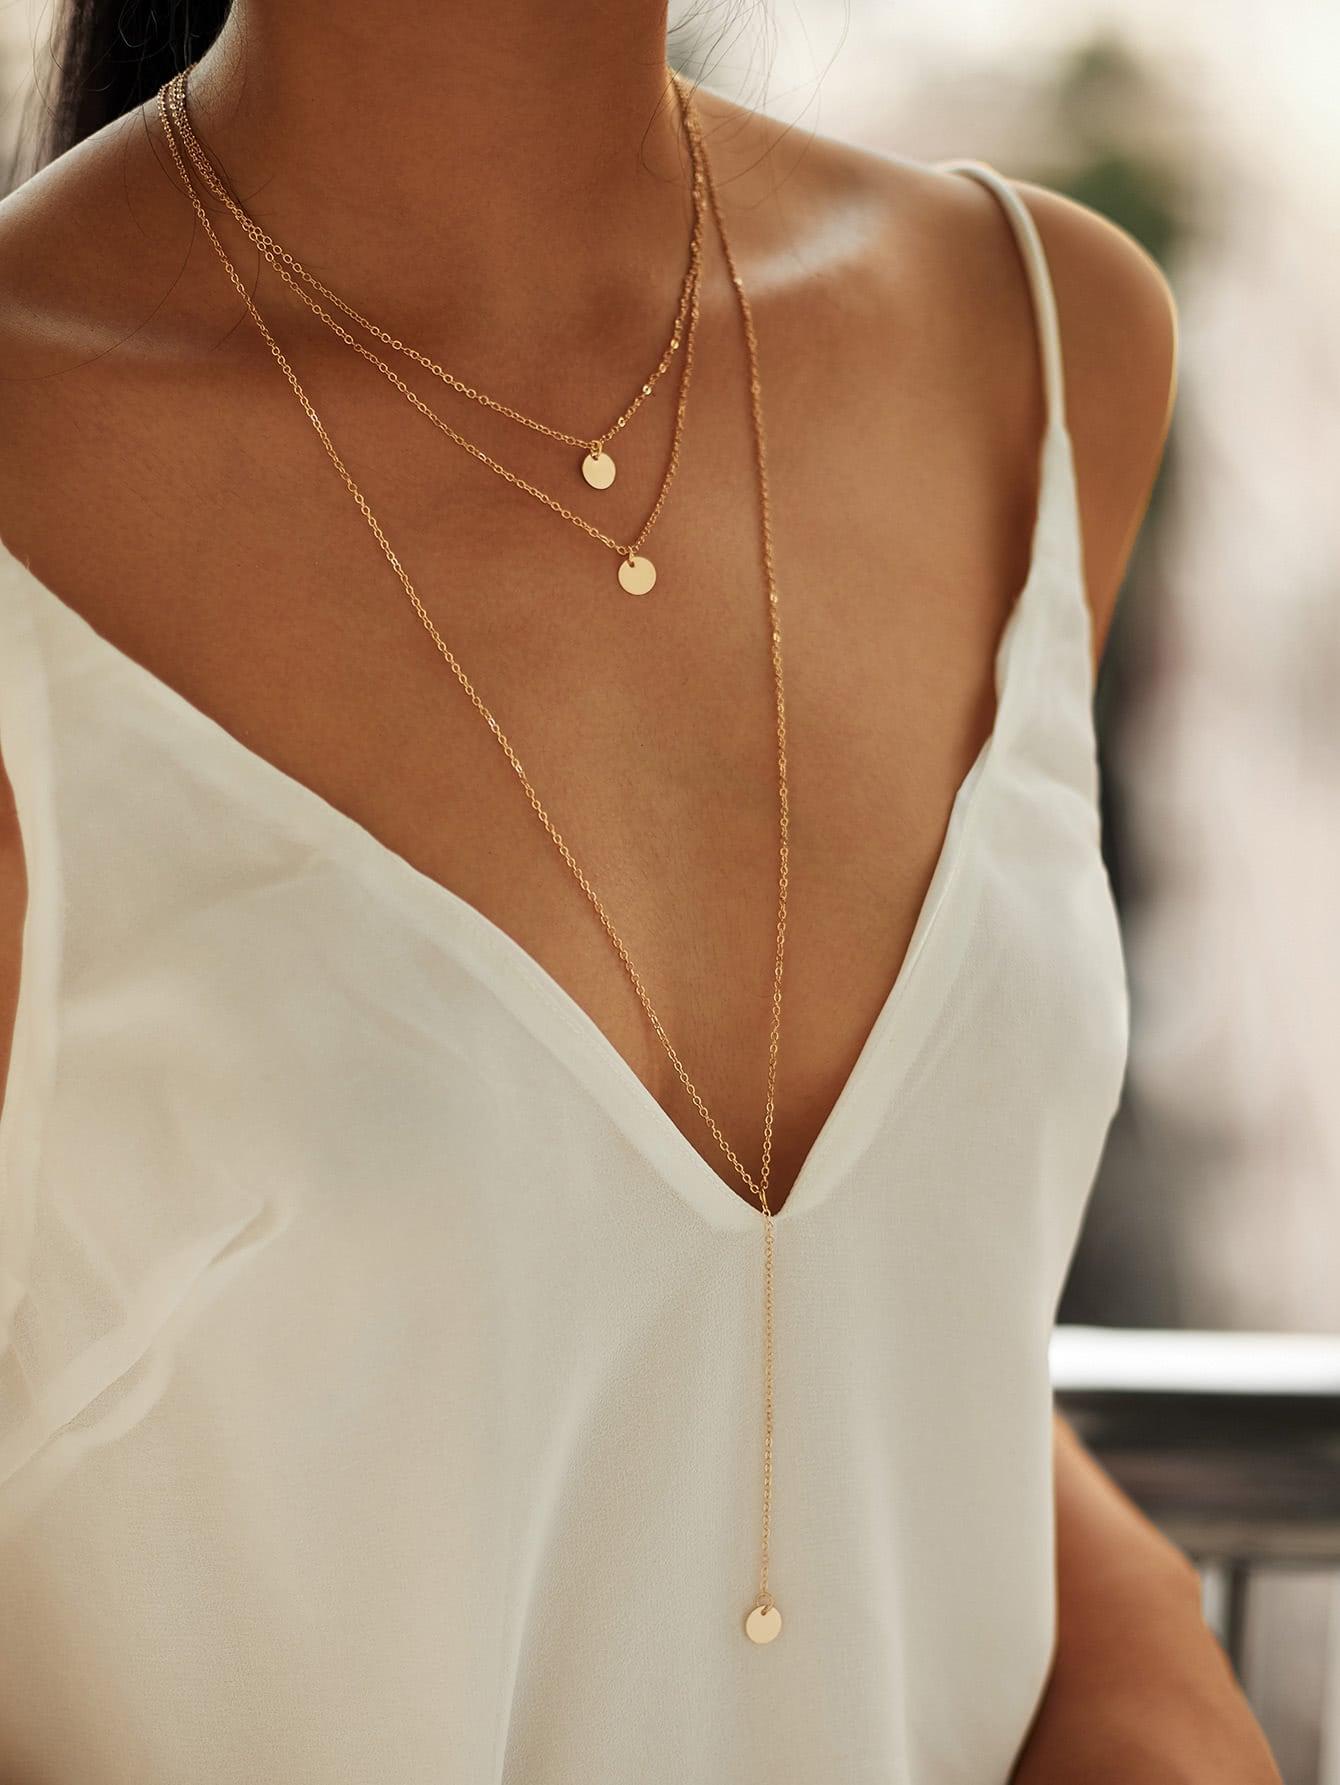 Round Pendant Layered Necklace Set